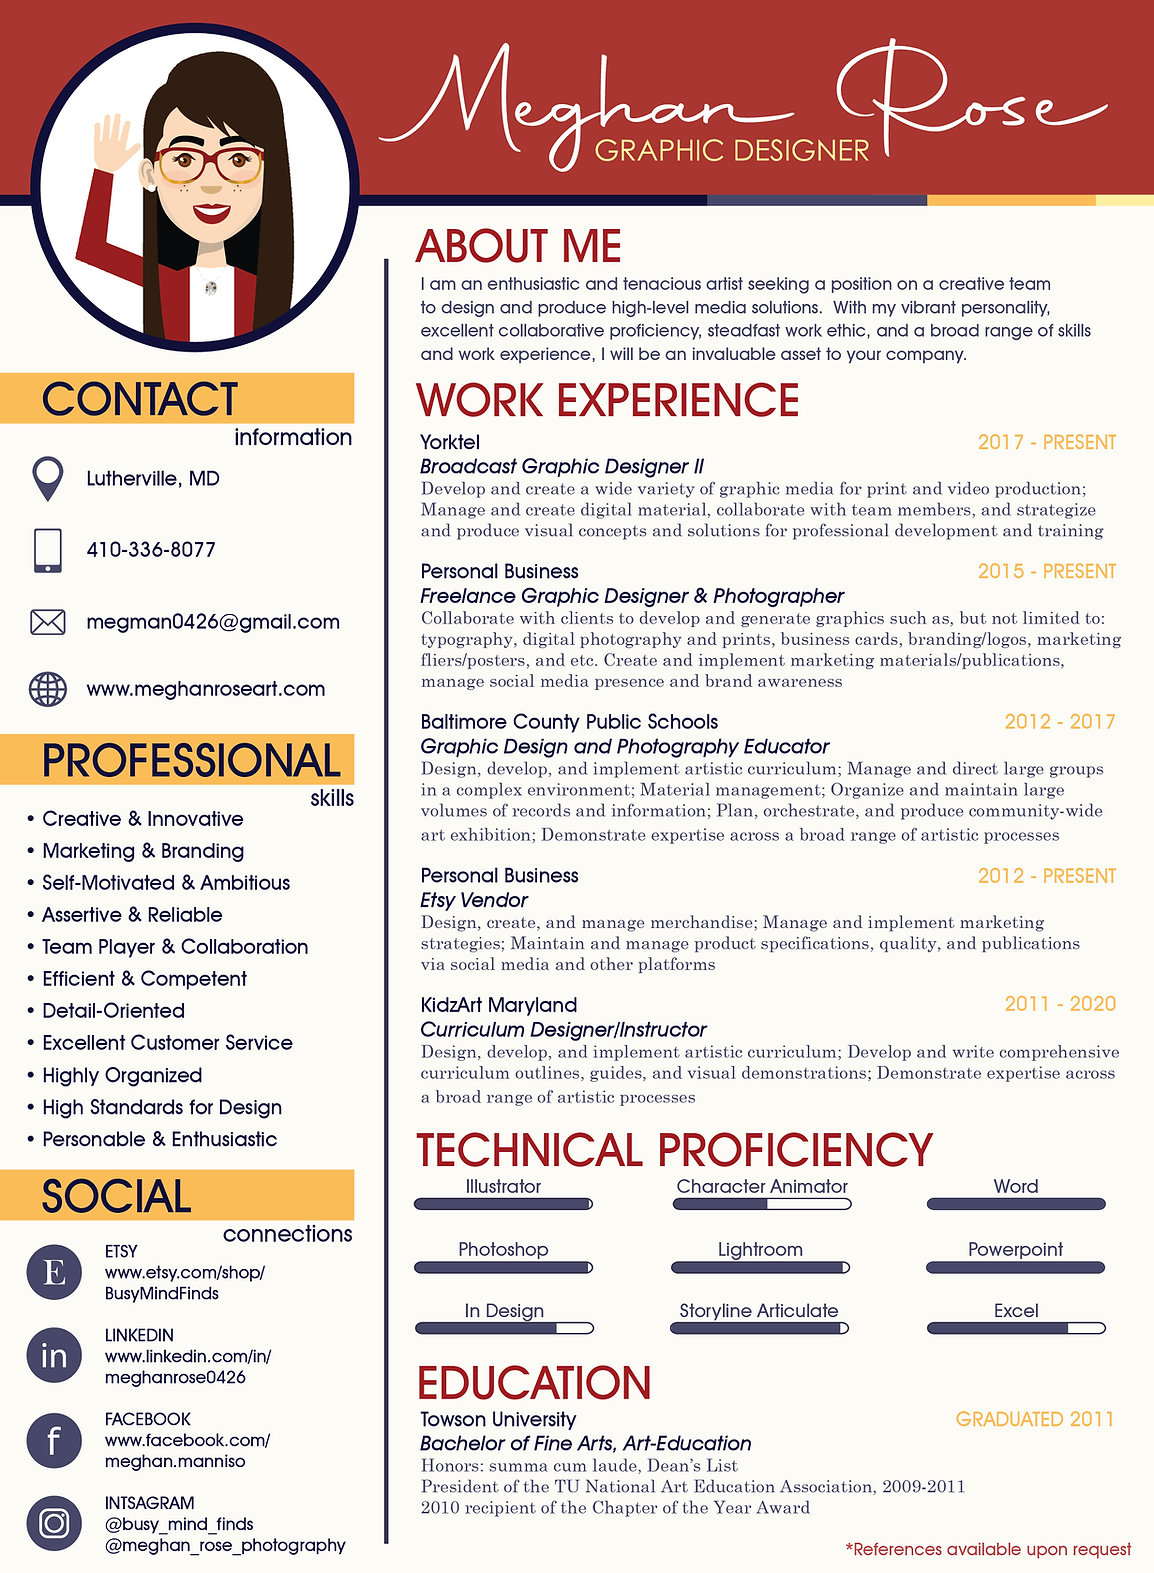 MeghanRose_Creative_Resume2021-03.jpg